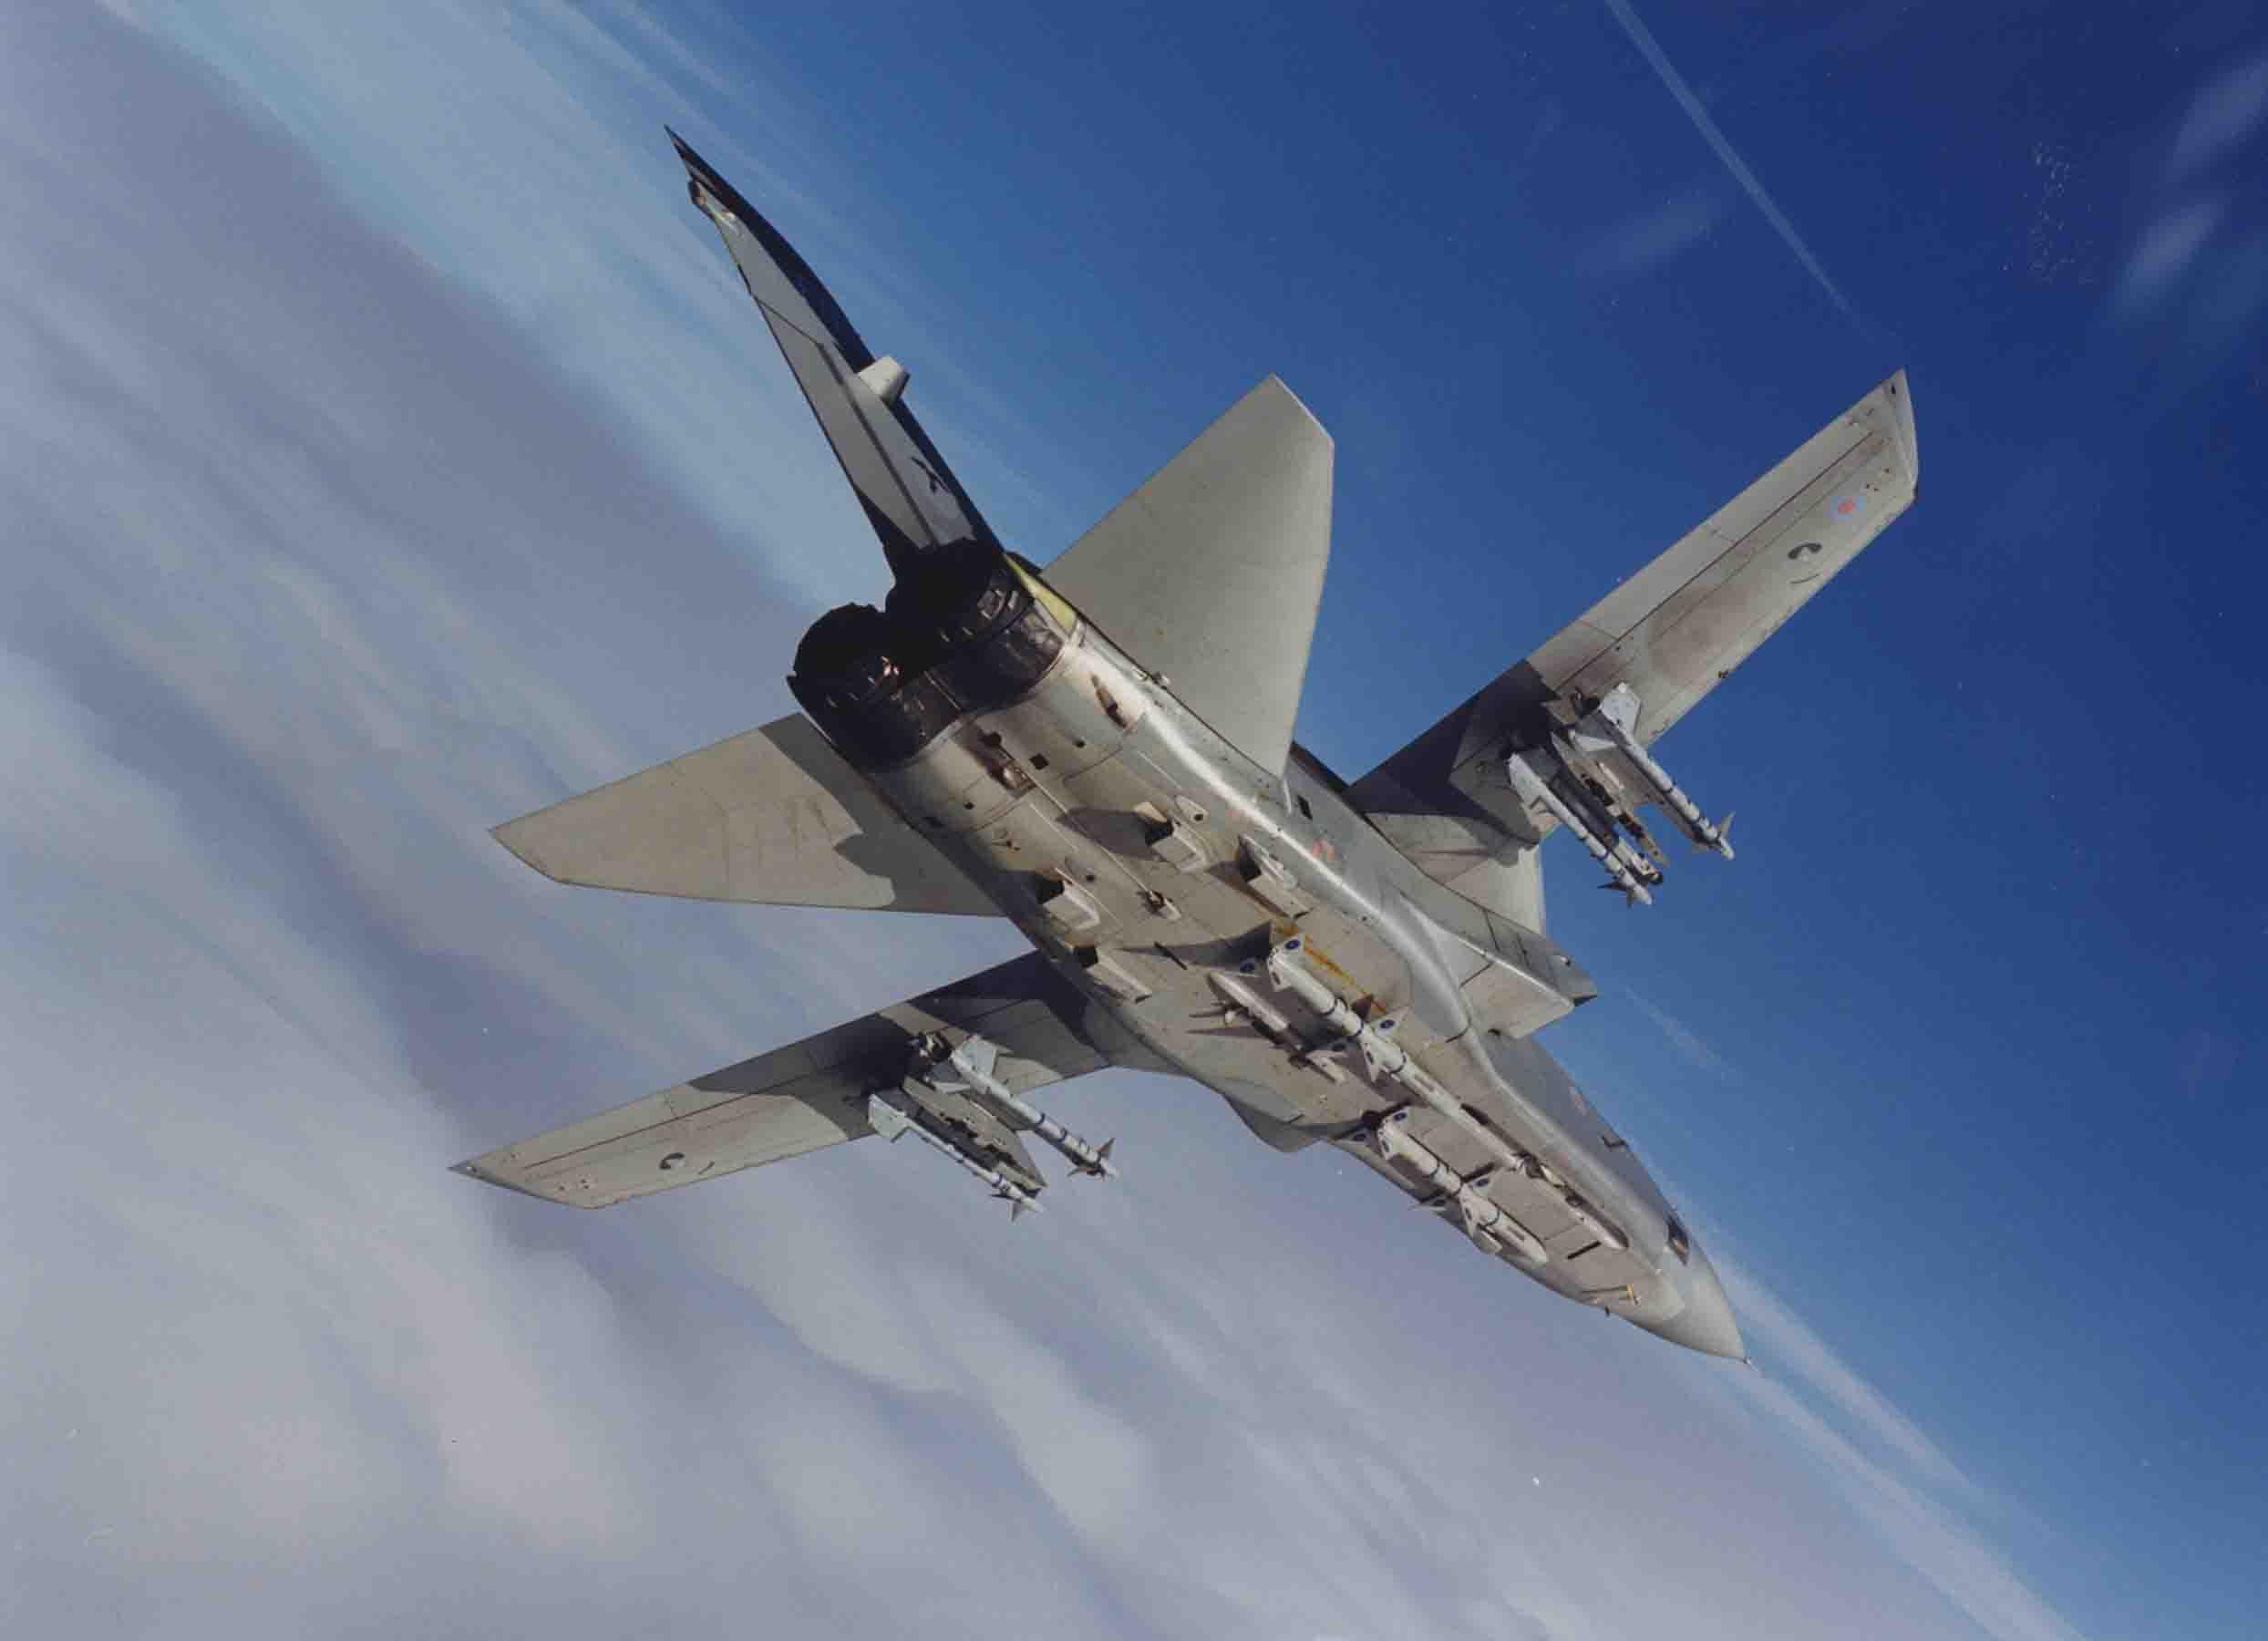 A Panavia Tornado in flight